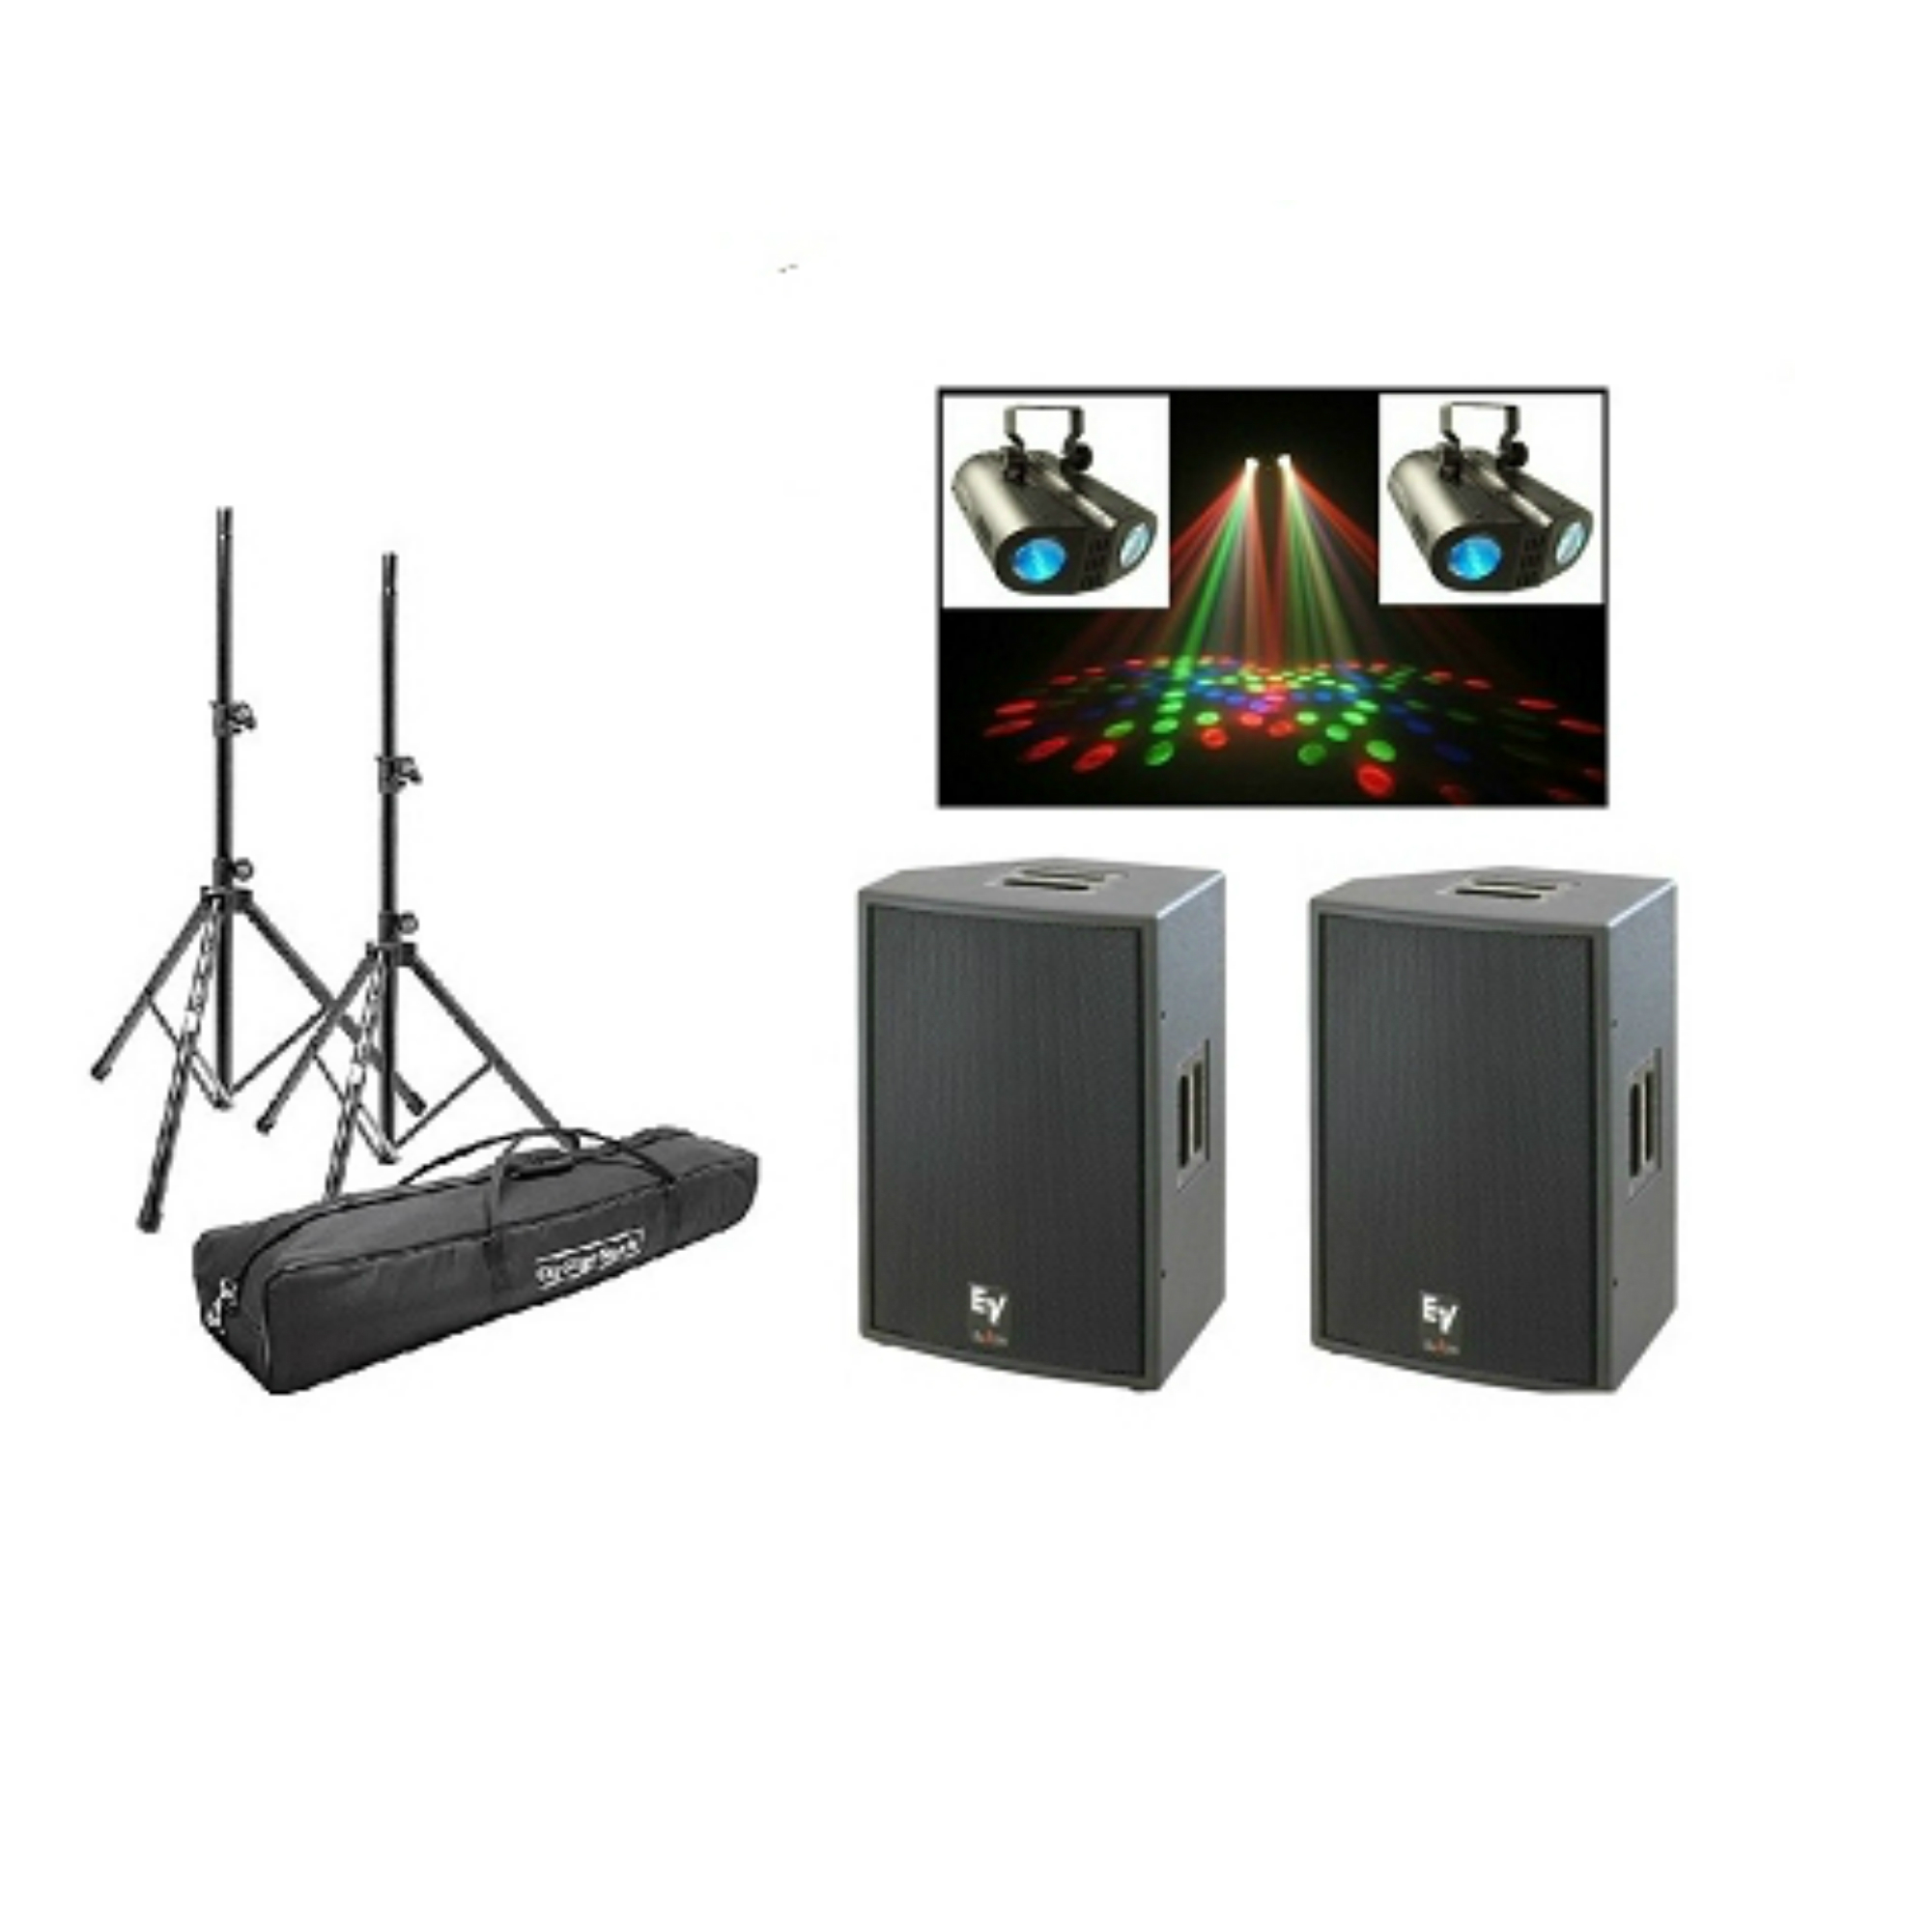 speaker and lighting rental package in miami sound company miami av service in miami dj. Black Bedroom Furniture Sets. Home Design Ideas